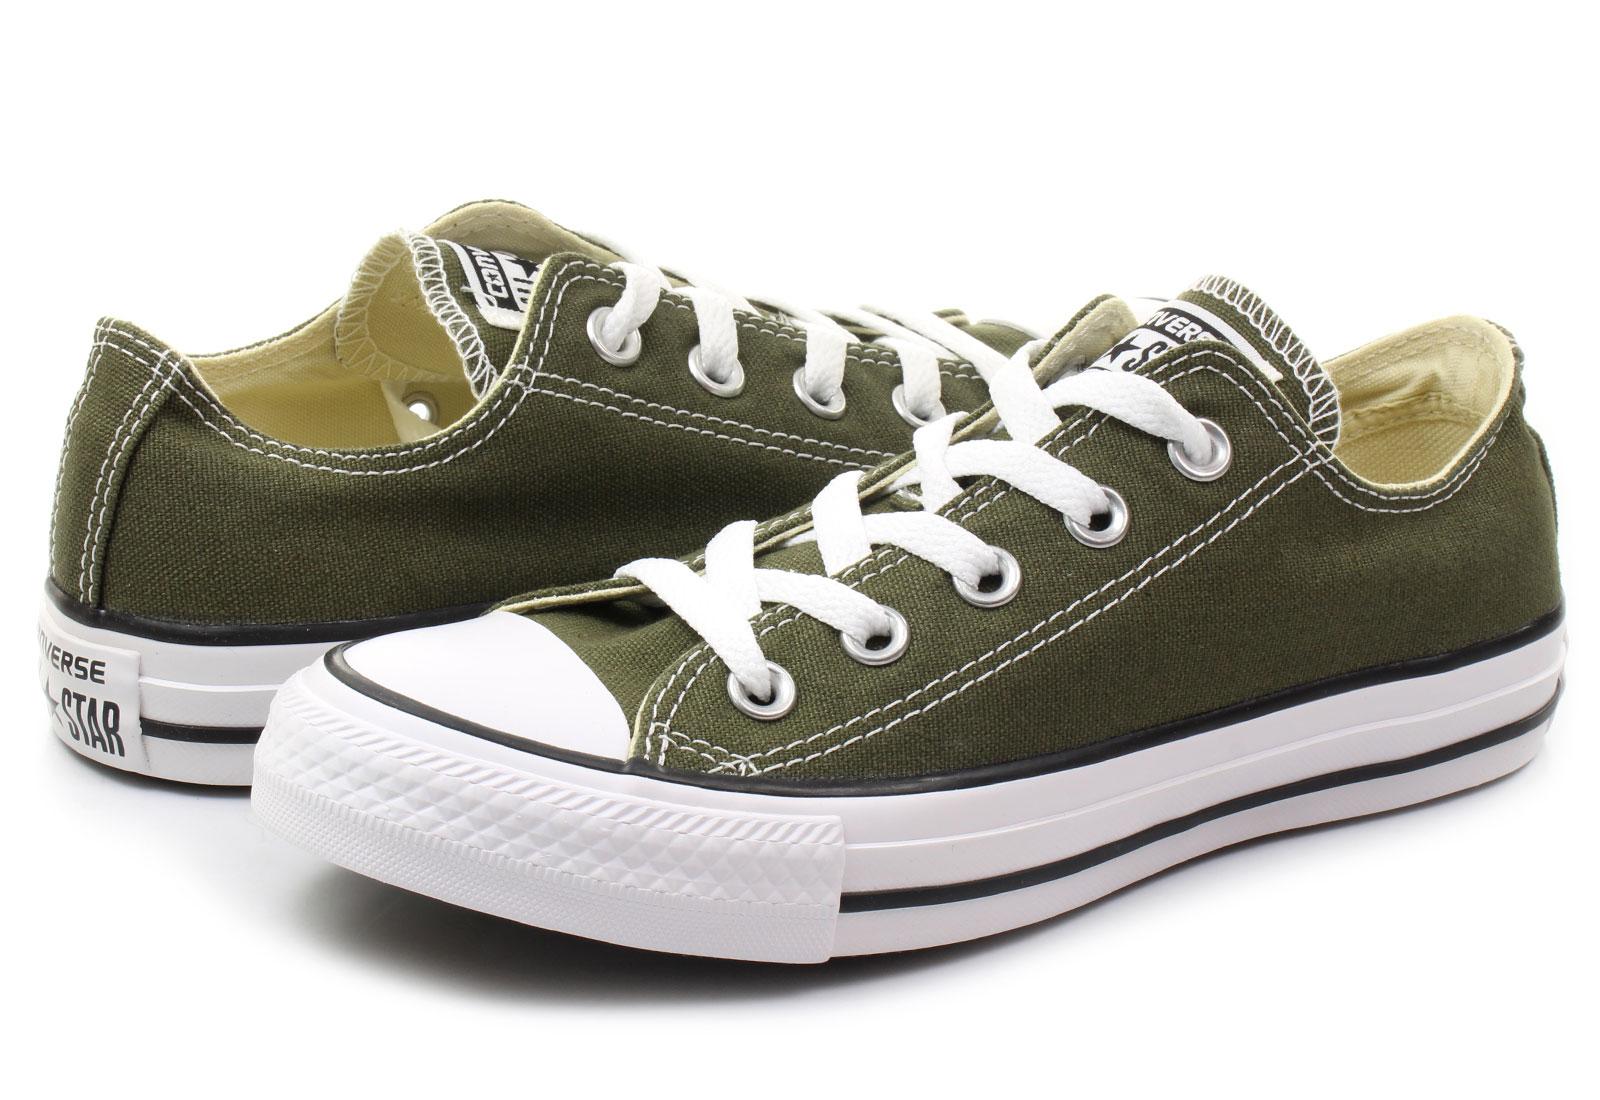 Converse Niske Tenisice Zelene Tenisice - Chuck Taylor All Star Seasonal Ox  - Office Shoes - Online trgovina obuće a8fe0b4b552